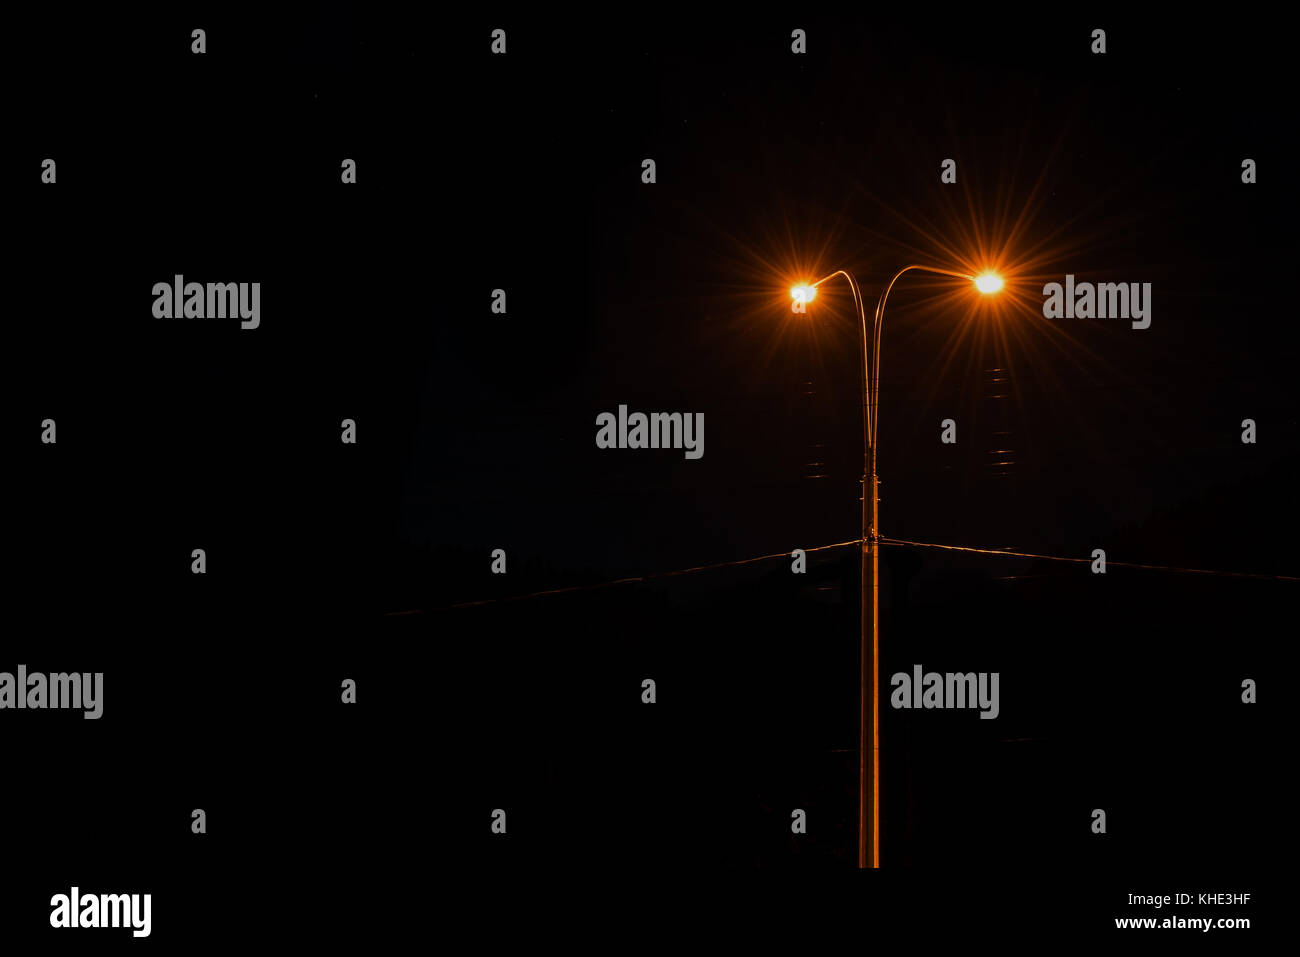 High urban street light shines against the night black sky - Stock Image